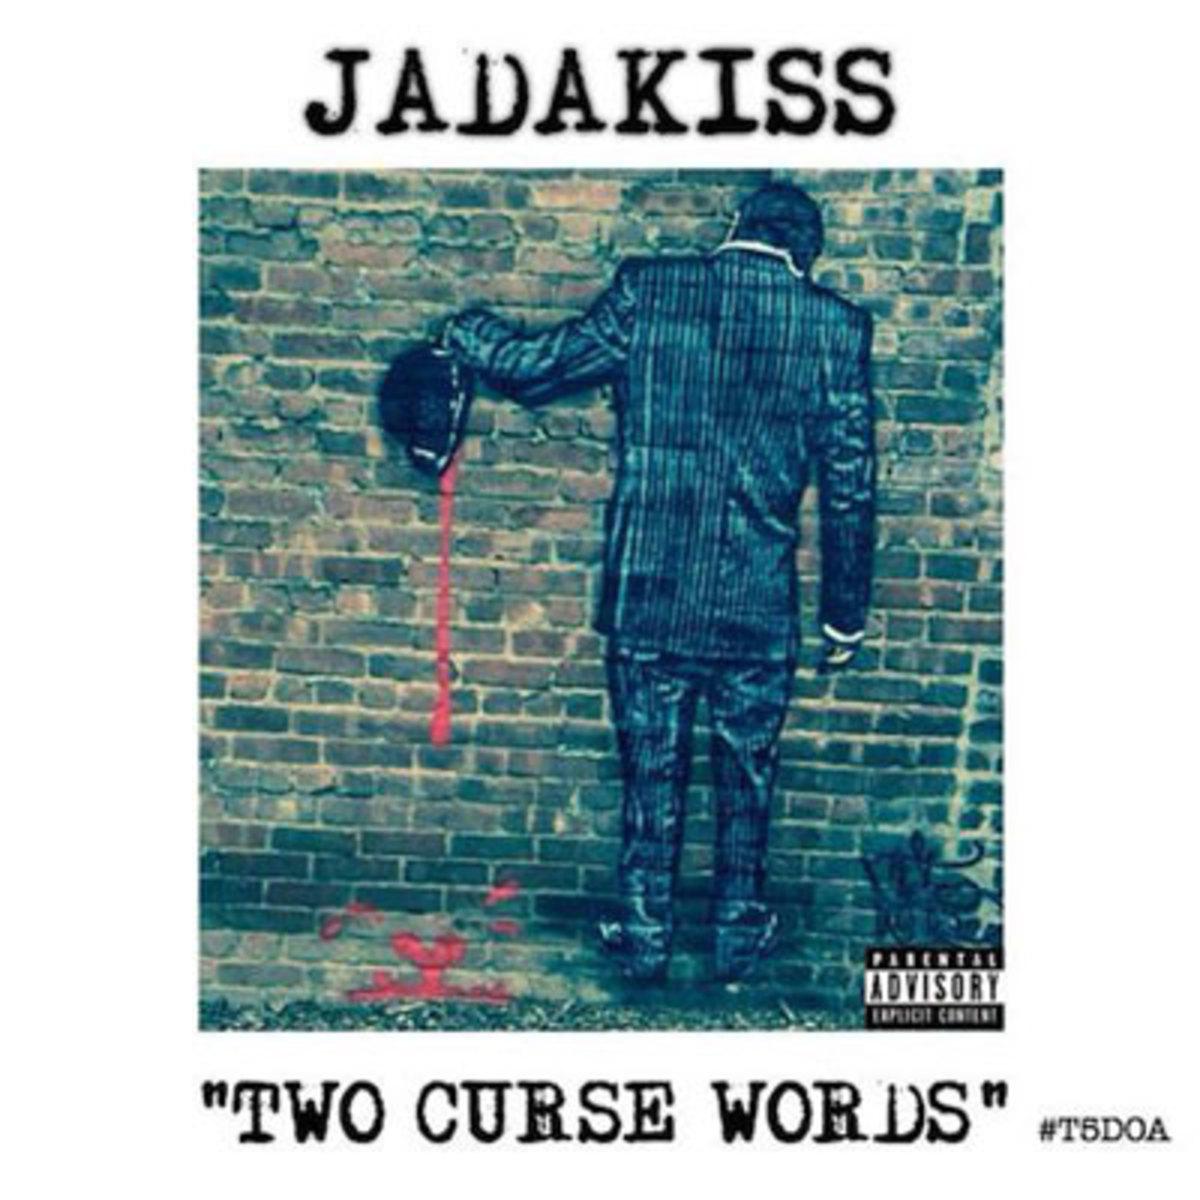 jadakiss-two-curse-words.jpg